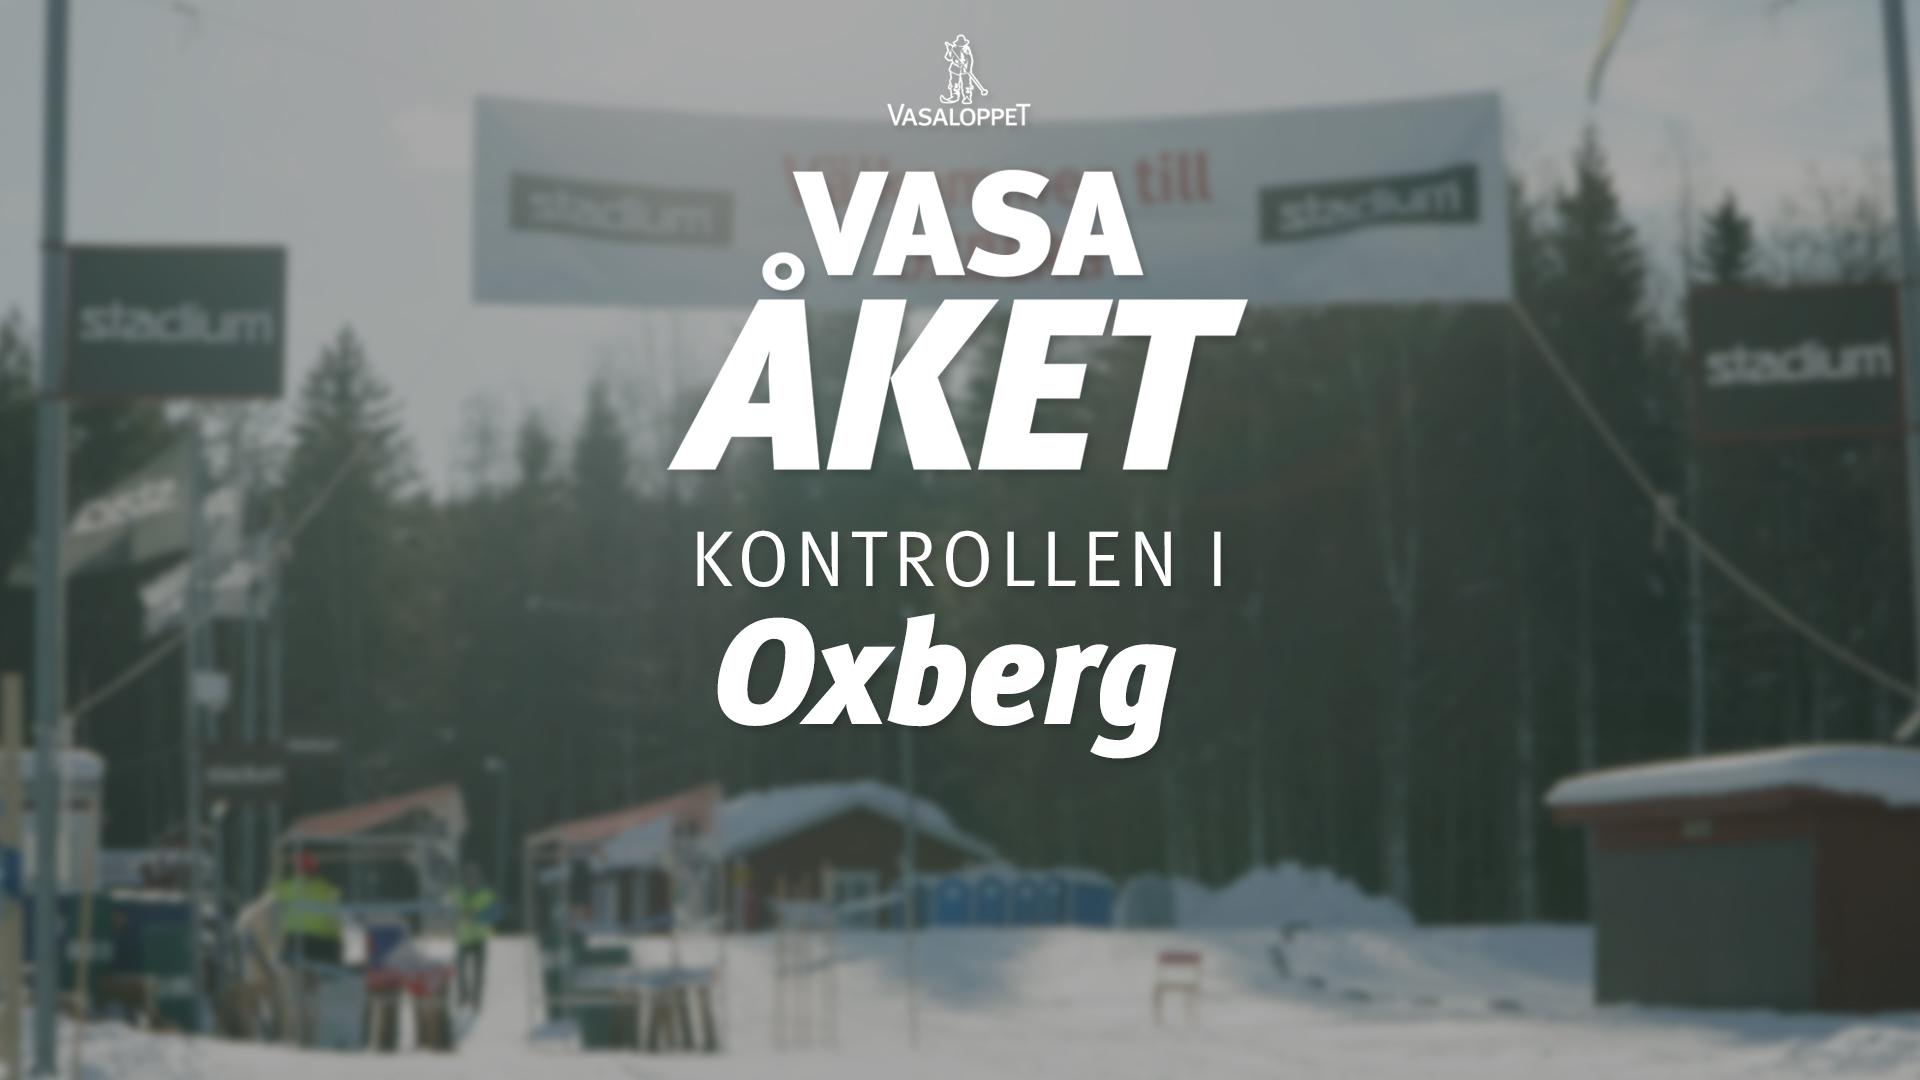 4 mars, 2021 – Oxberg